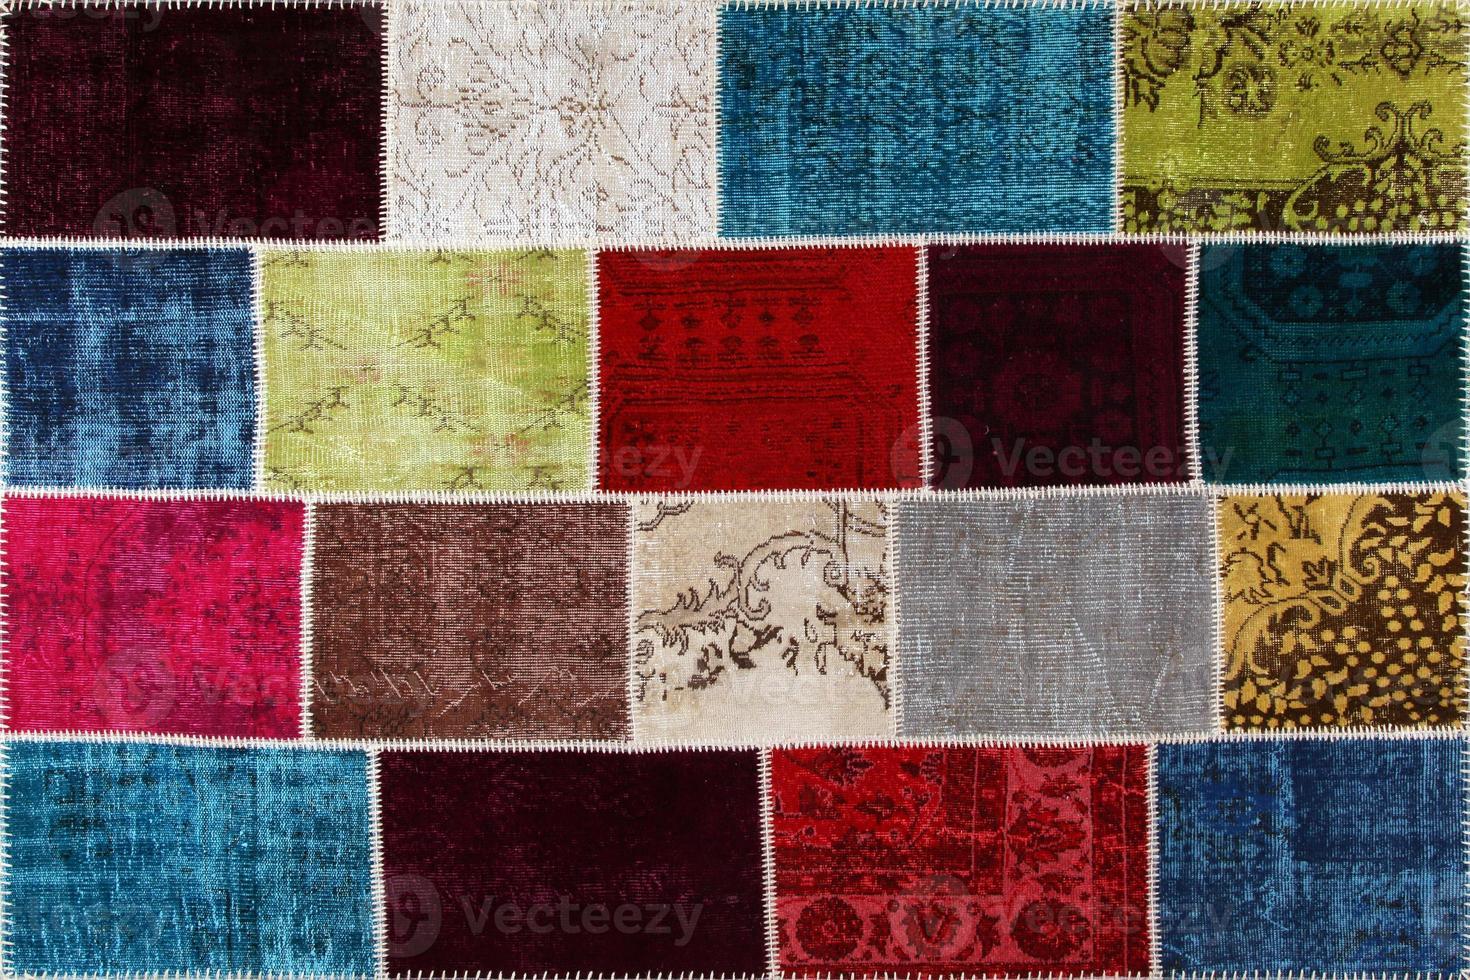 Turkish carpet patch work photo